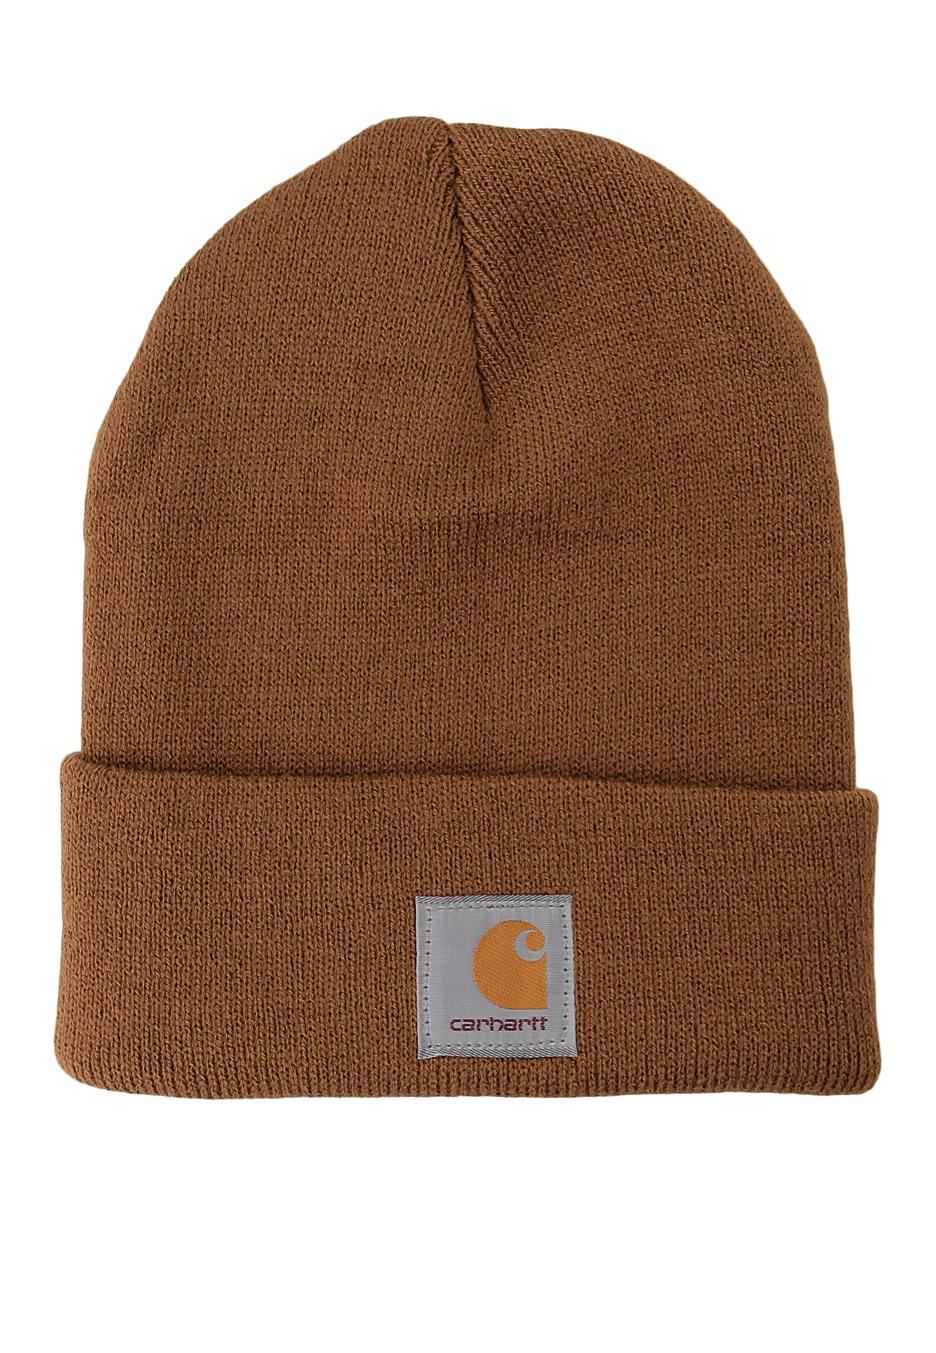 33702754373690 Carhartt WIP - Acrylic Watch Carhartt Brown - Beanie - Streetwear Shop -  Impericon.com UK